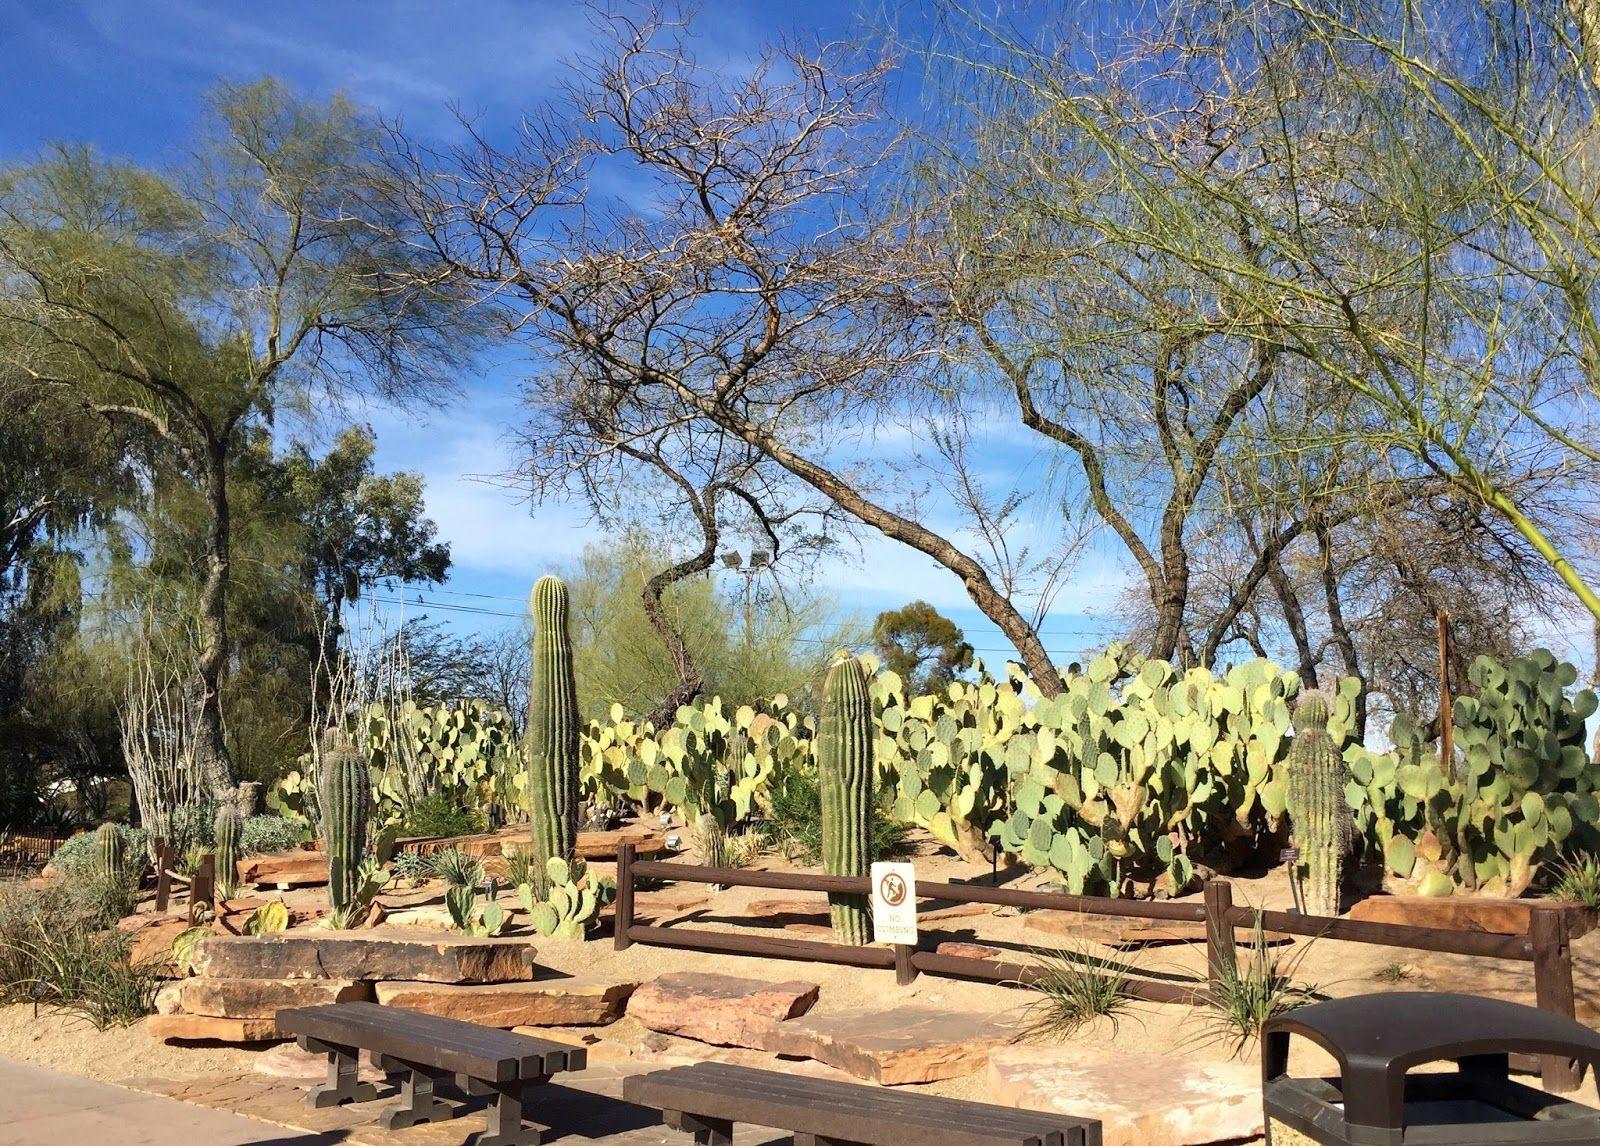 34b363c7d6bfa75a8e1ab0e6d896c5ea - Ethel M Chocolate Factory And Botanical Cactus Gardens Las Vegas